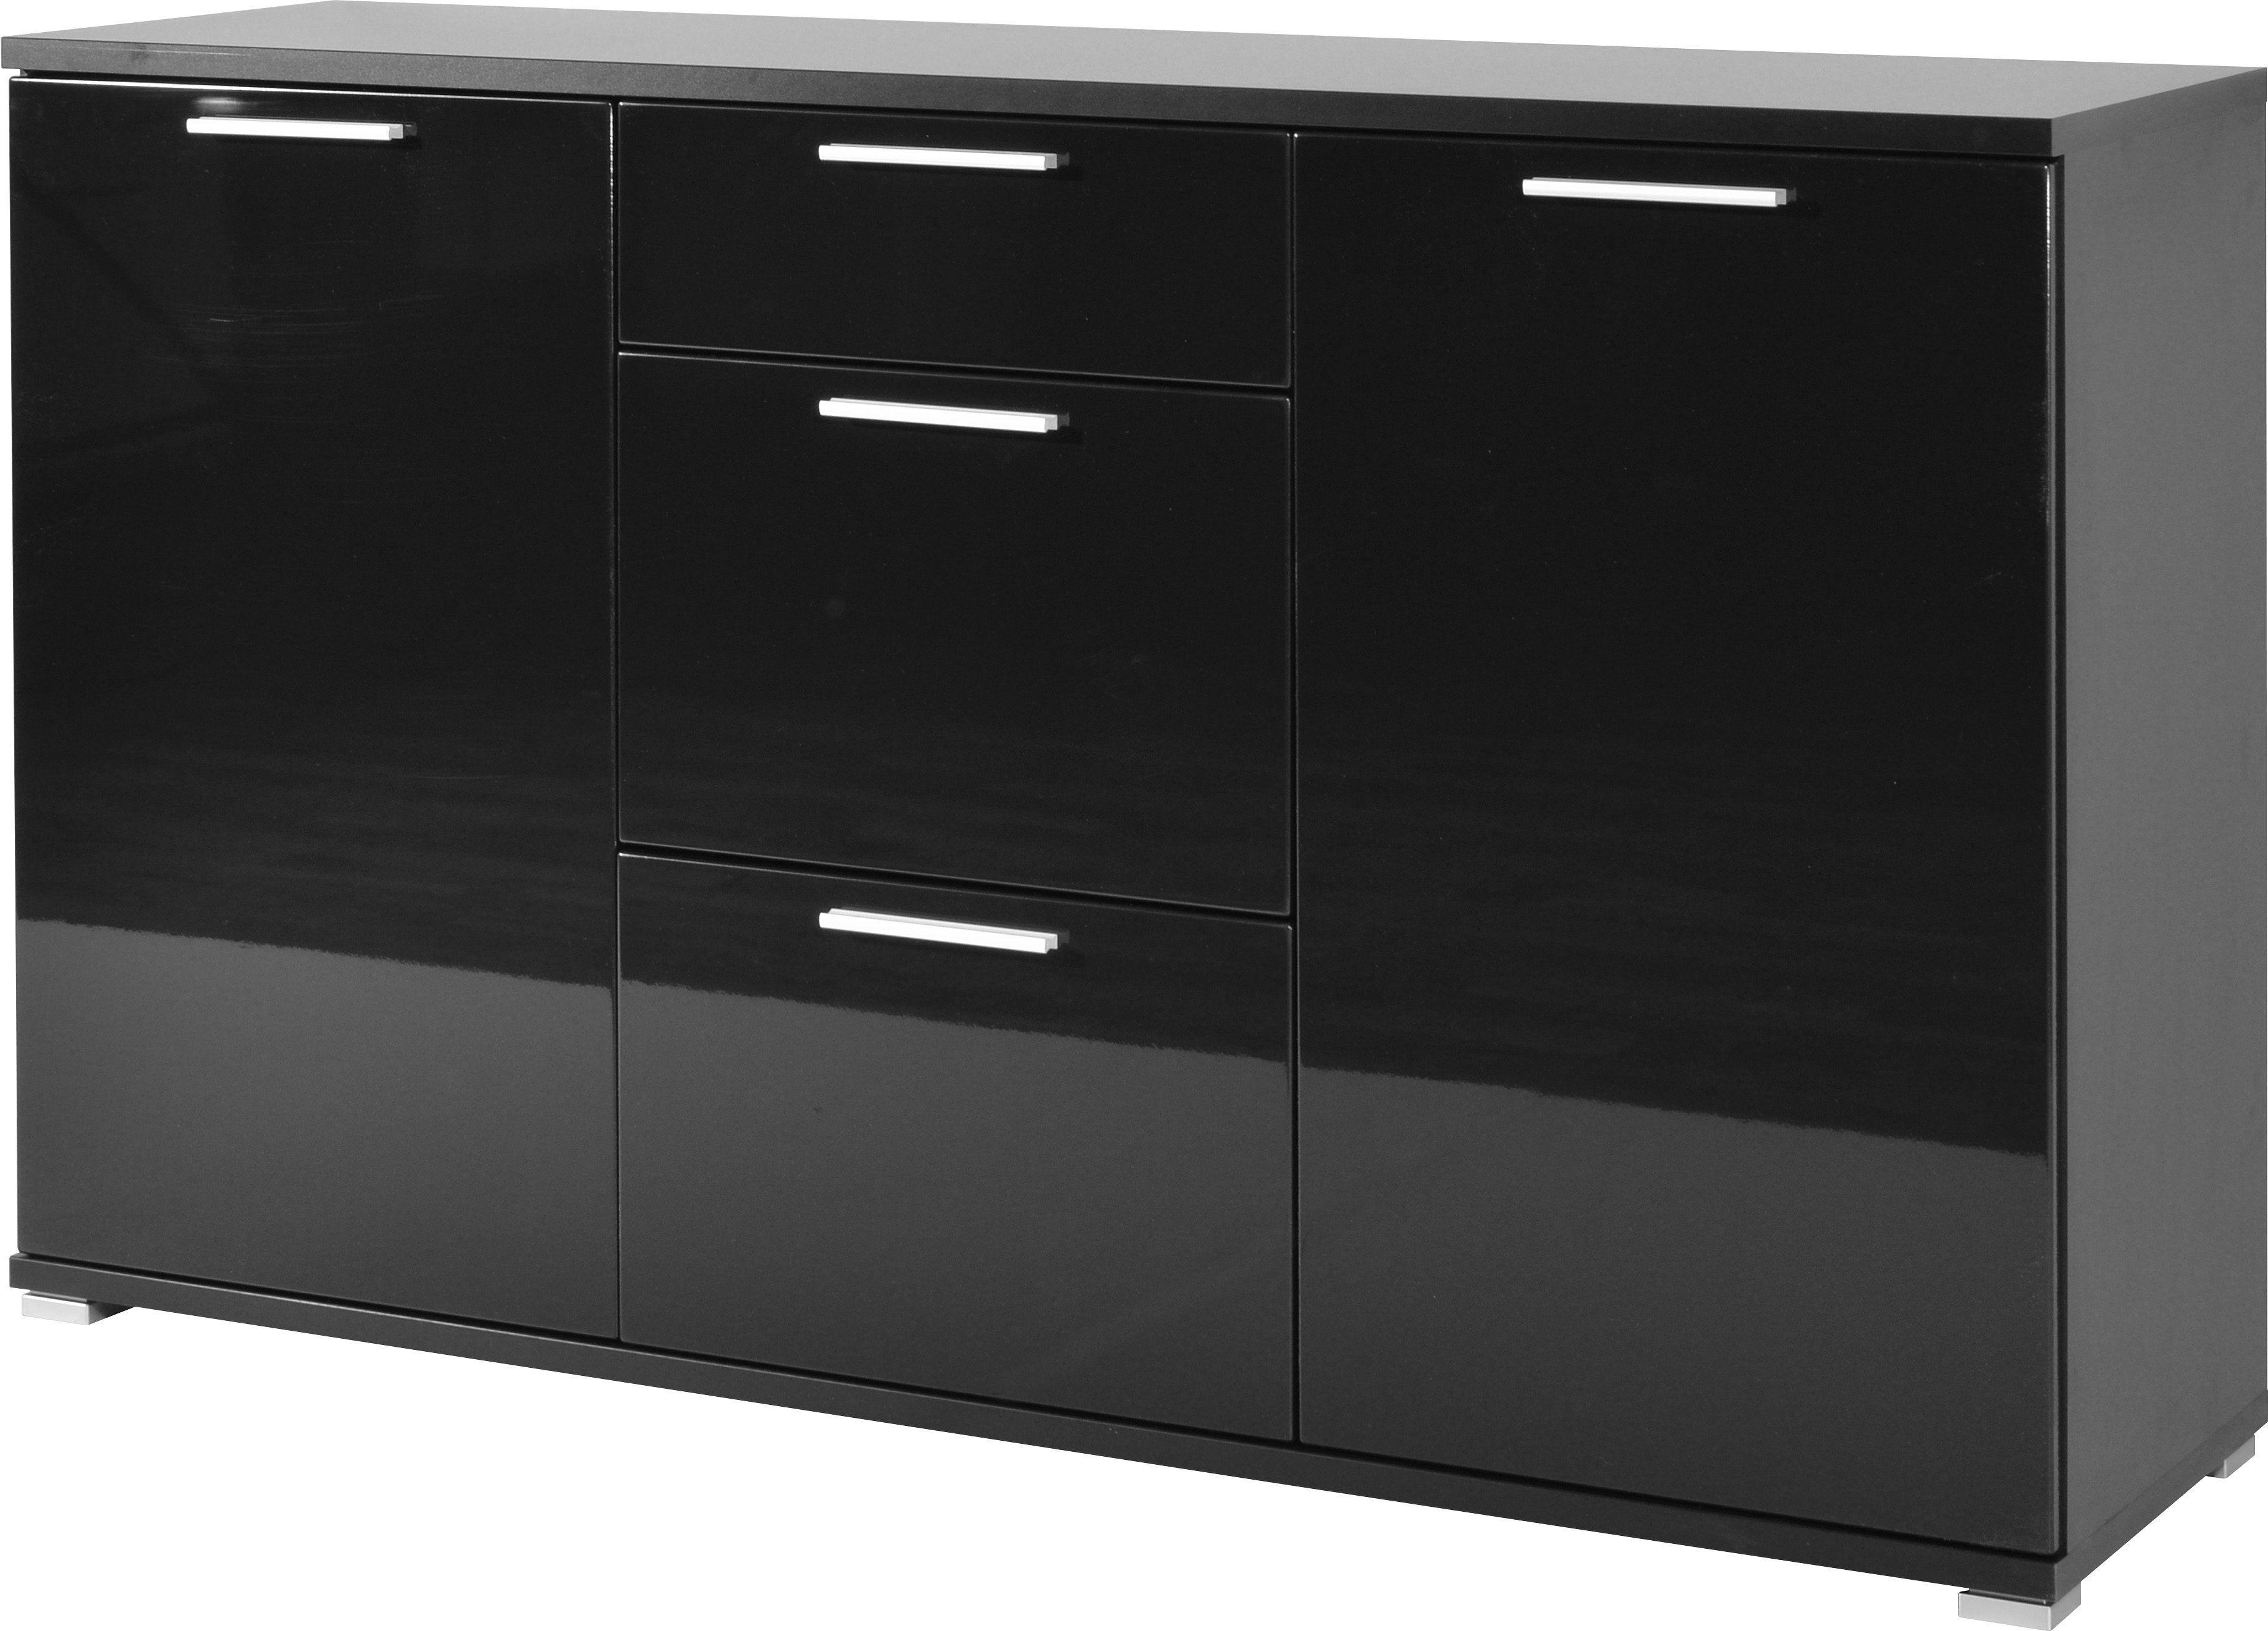 GERMANIA Sideboard »Almeria« Breite 144 cm